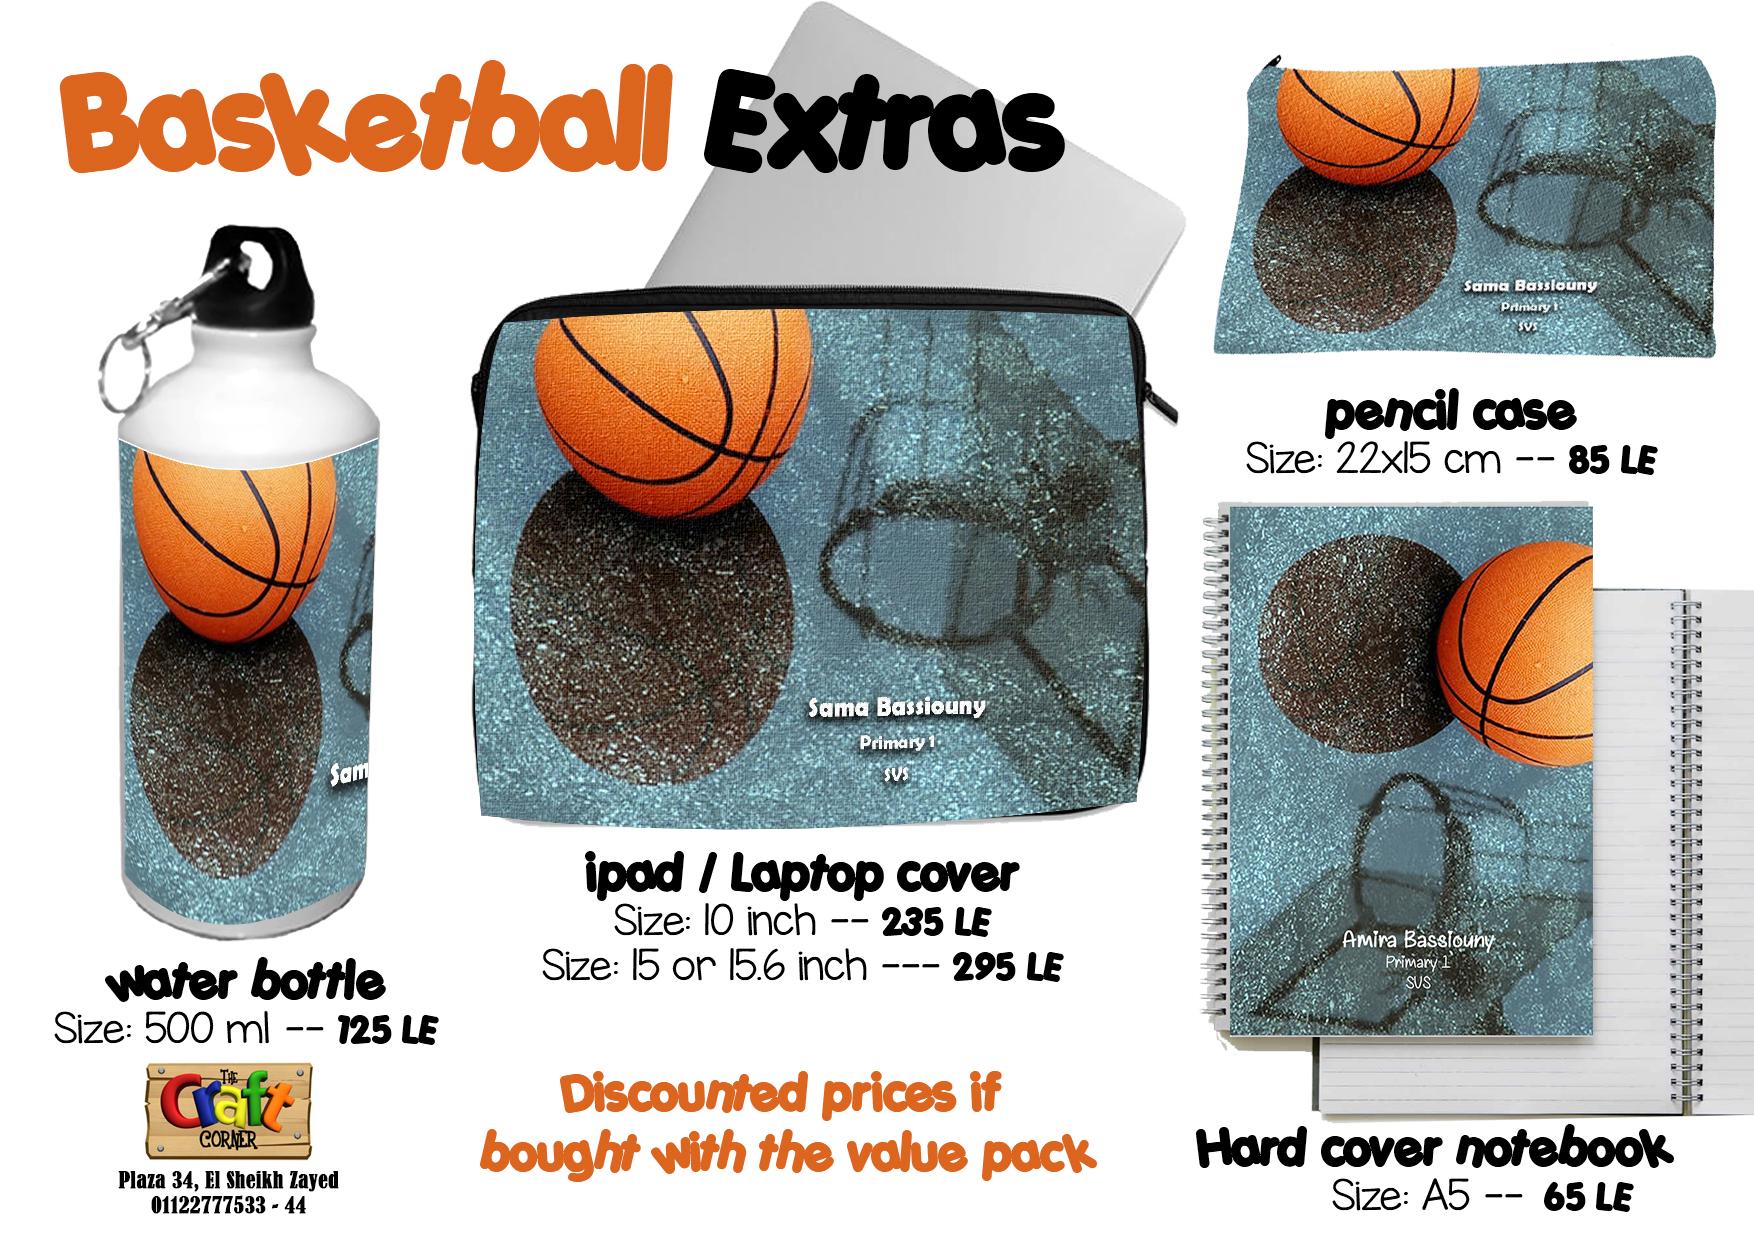 Basket ball Extras